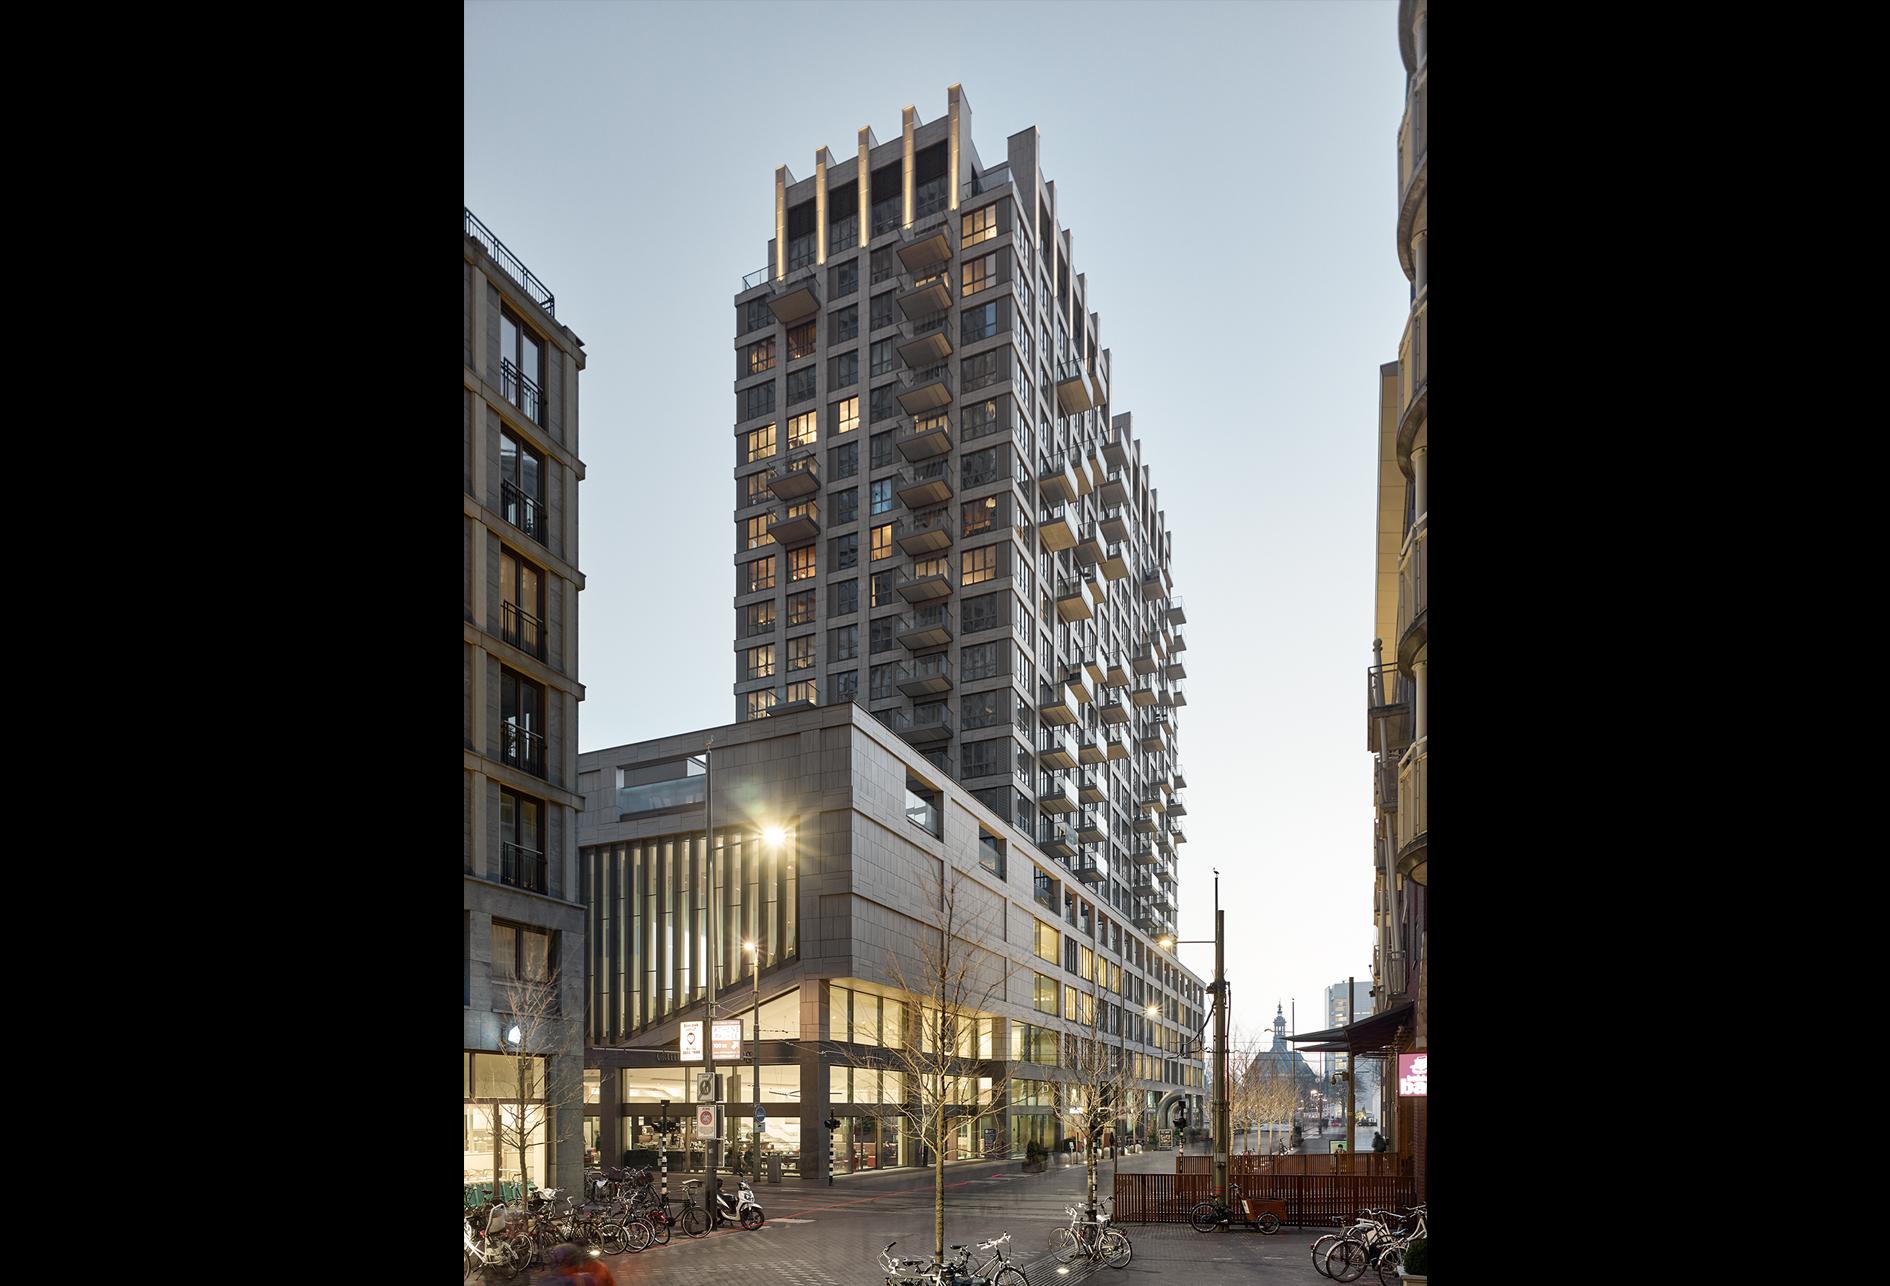 <p>de appartemententoren en de Faculteit Campus Den Haag, foto Stefan Müller</p>